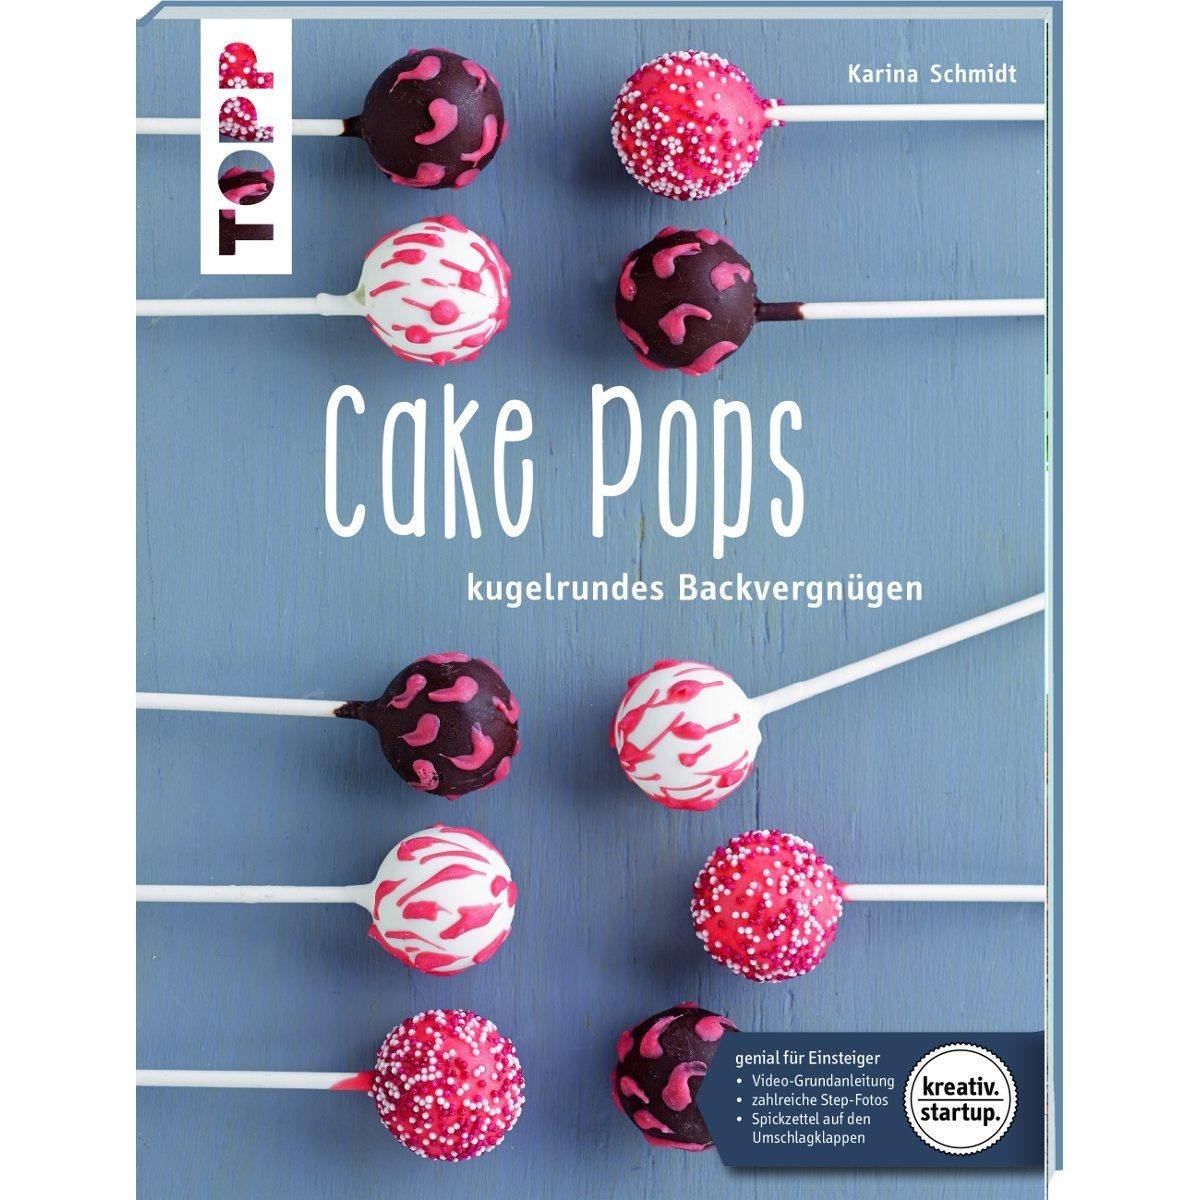 Cake Pops: Backbuch für kugelrundes Backvergnügen